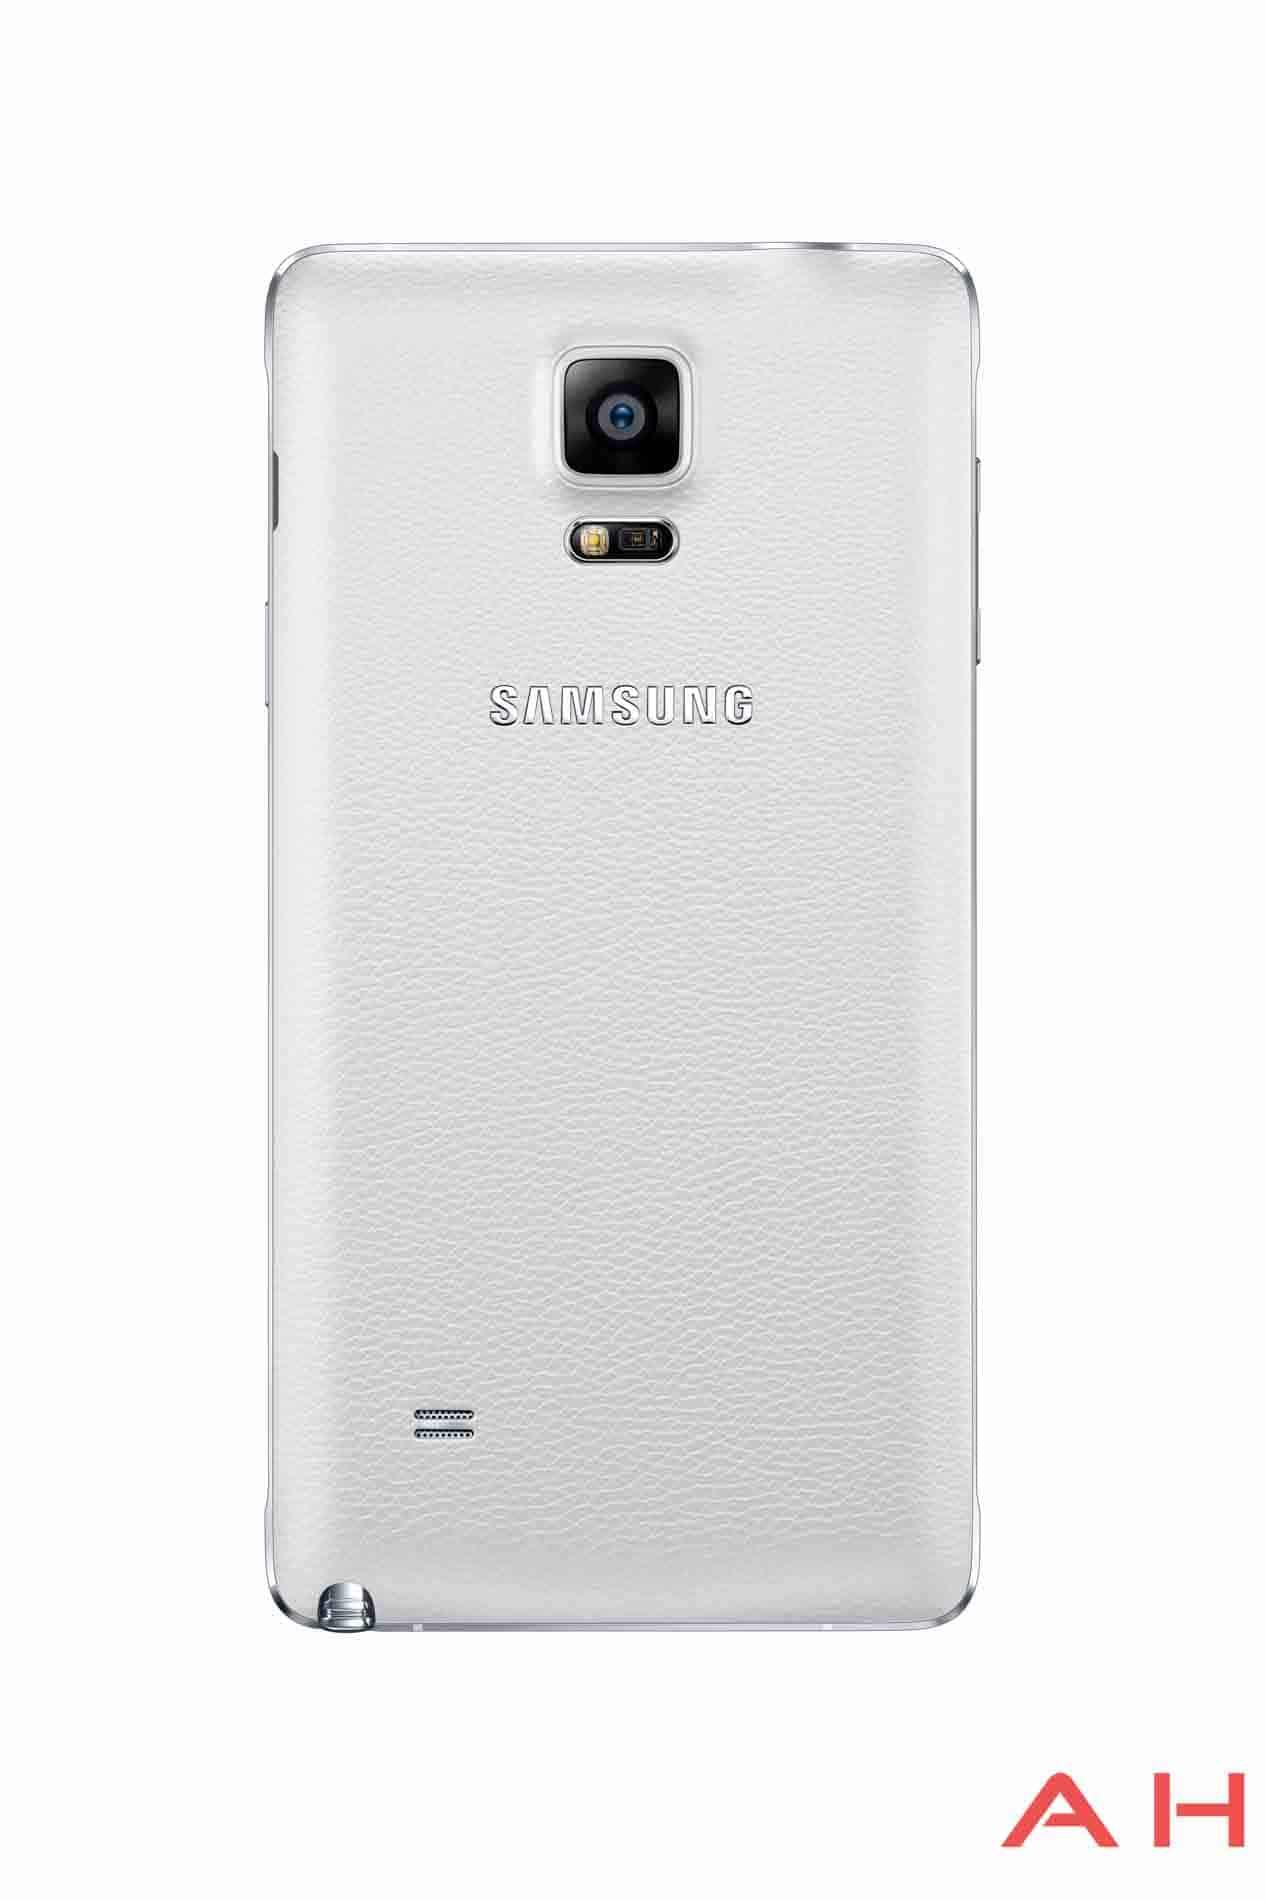 Samsung Galaxy Note 4 AH 10